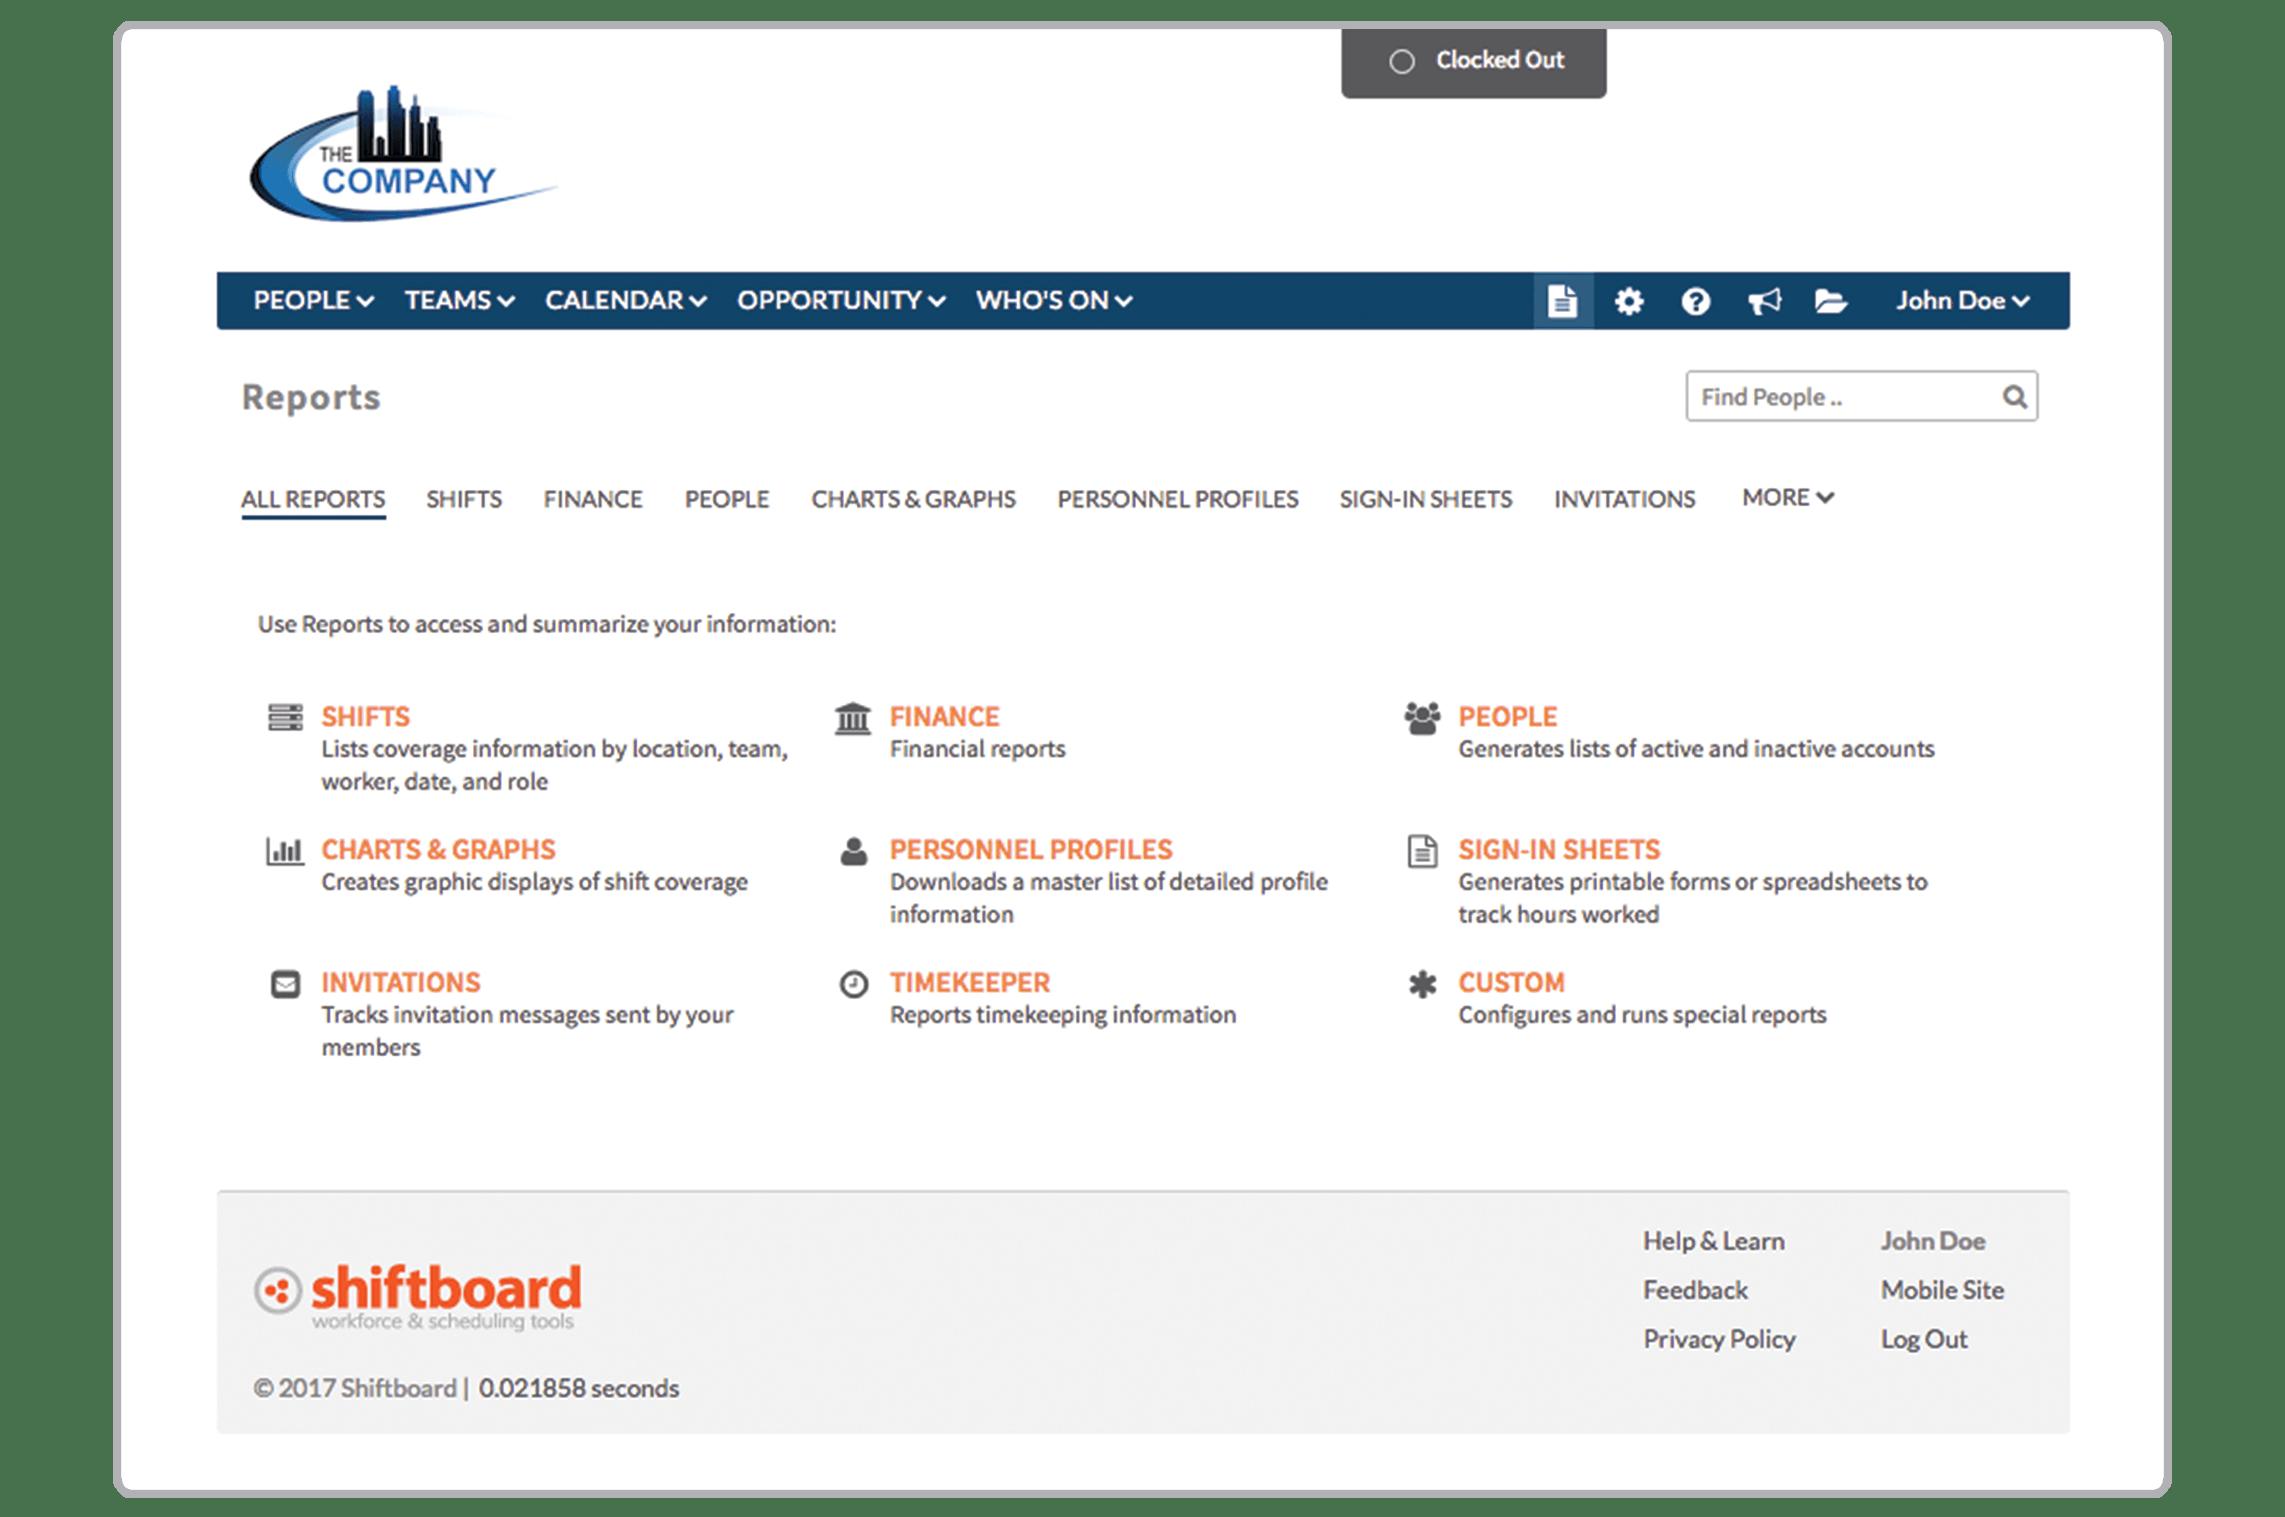 Shiftboard Software - Reports